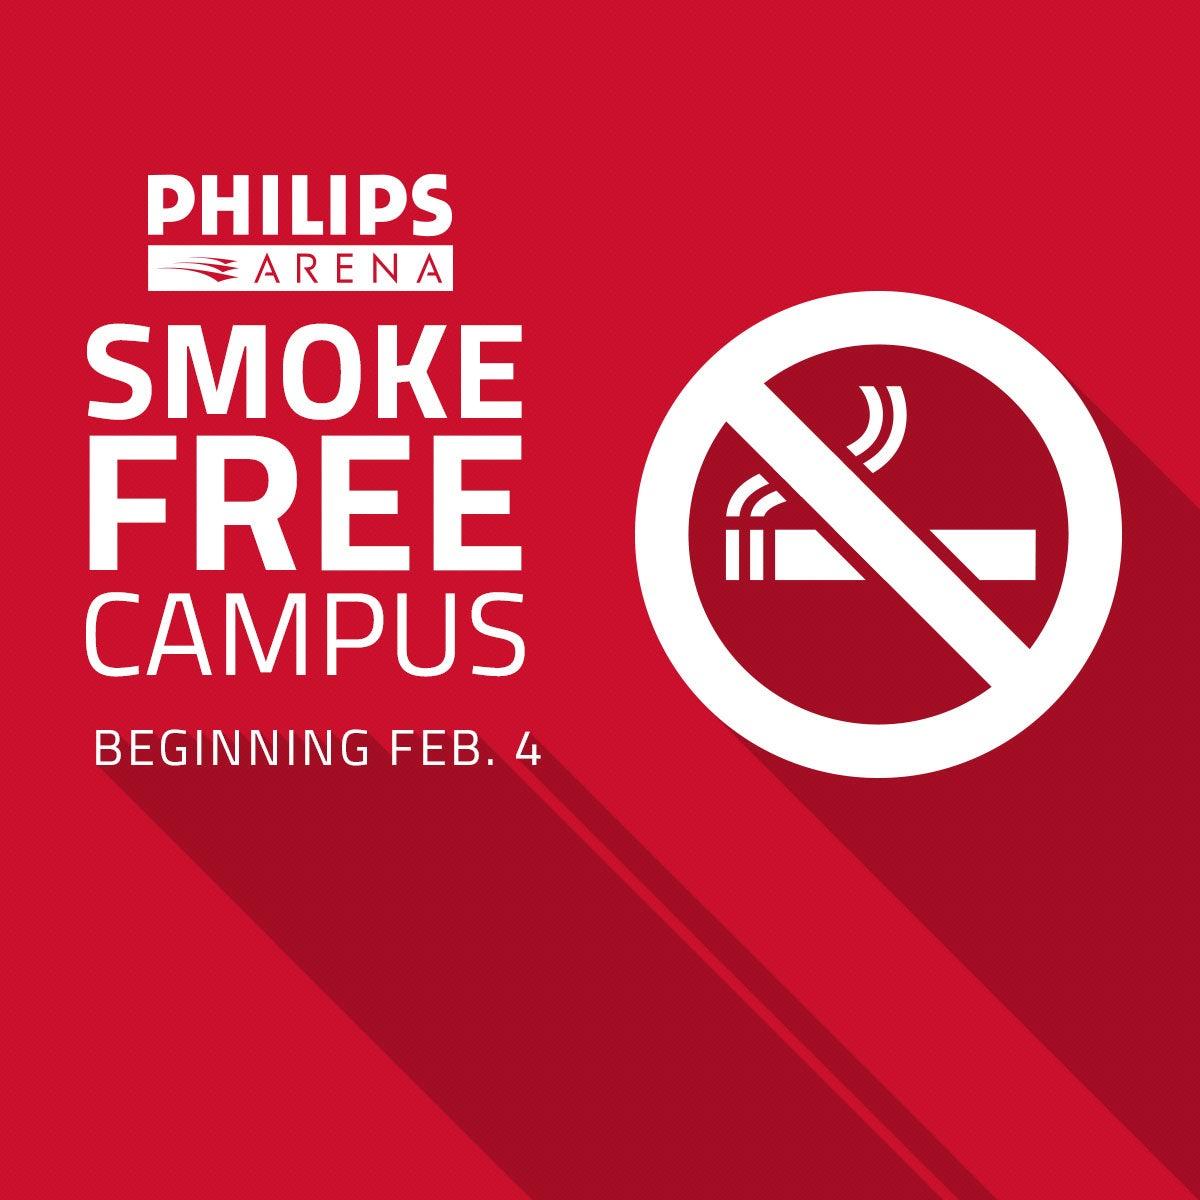 1617_HWK_PA_Smoke_Free_Philips_1200x1200.jpg